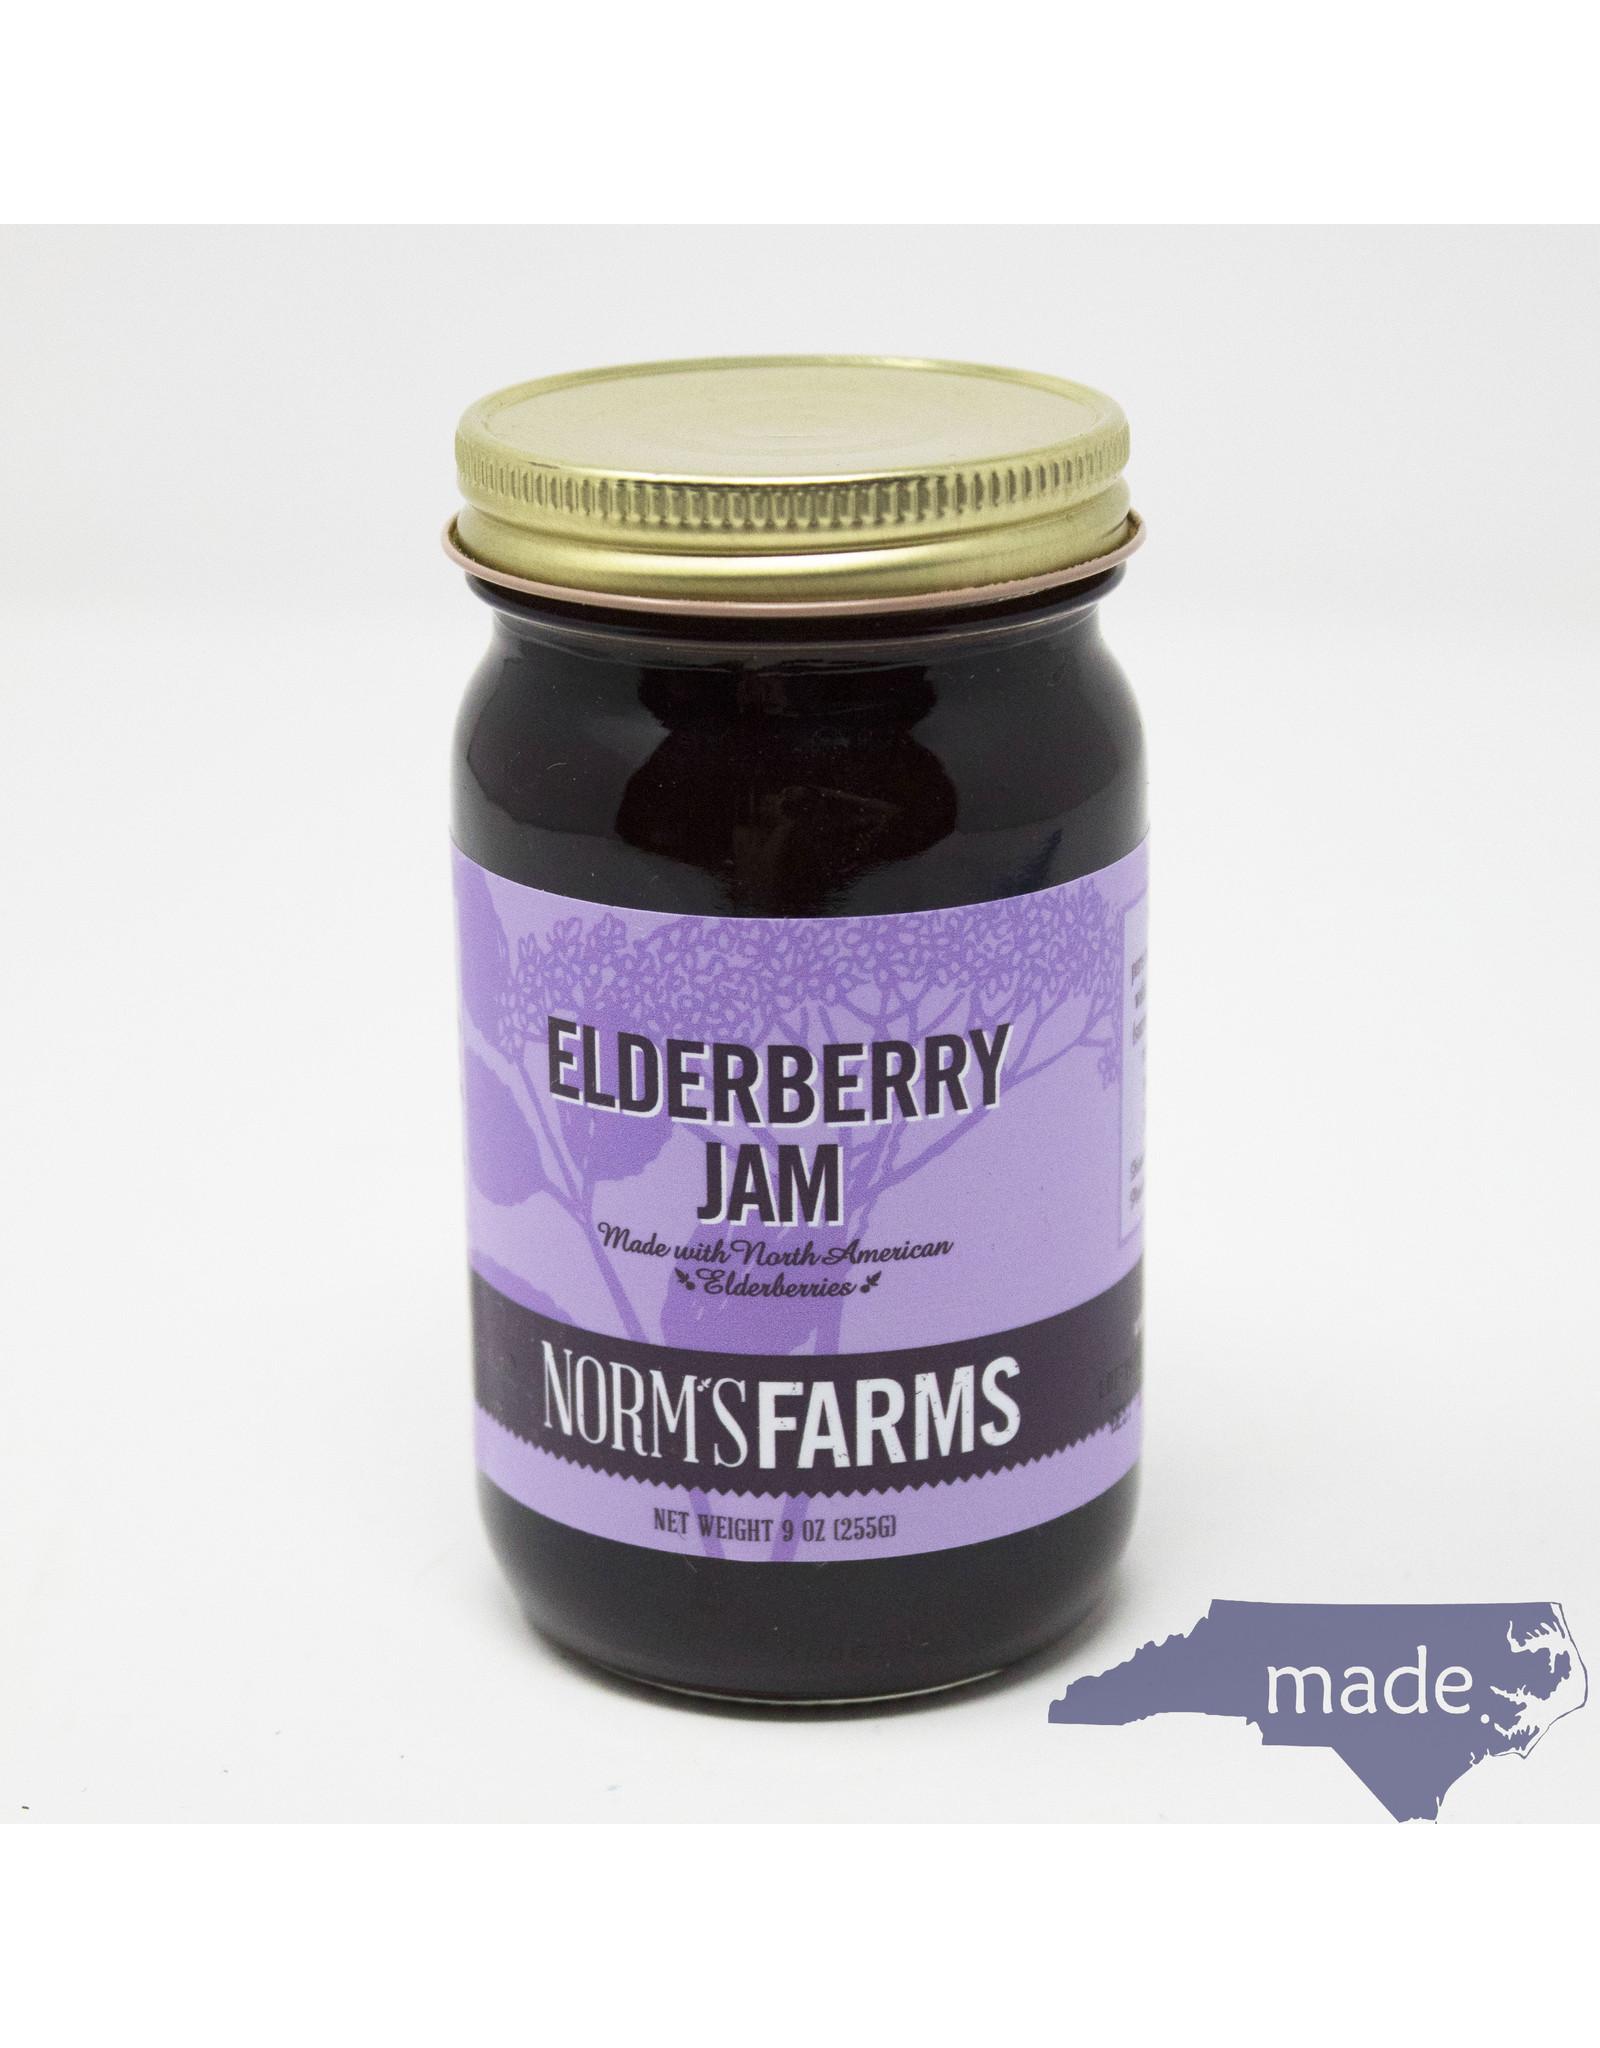 Norm's Farms Elderberry Jam - Norm's Farms